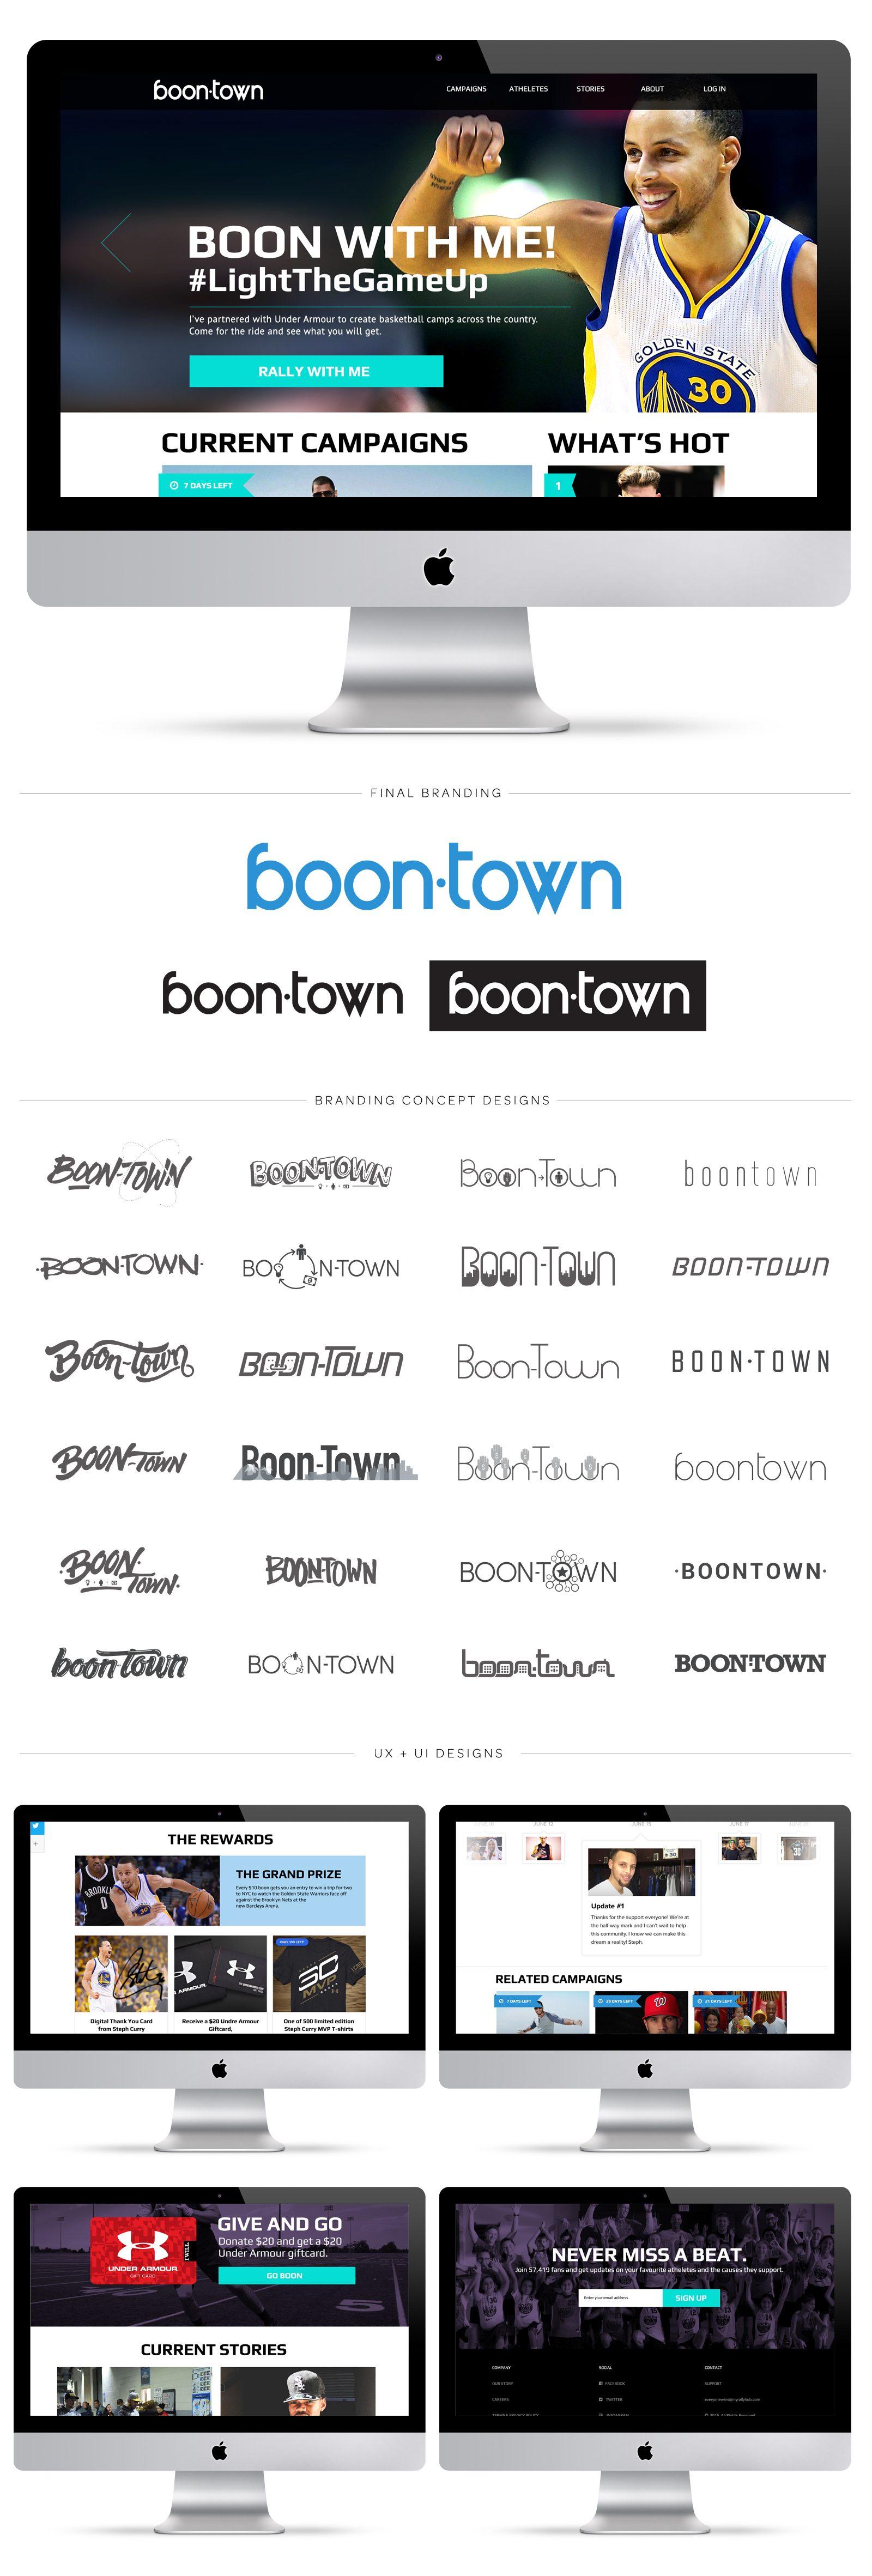 boontown_site_creative